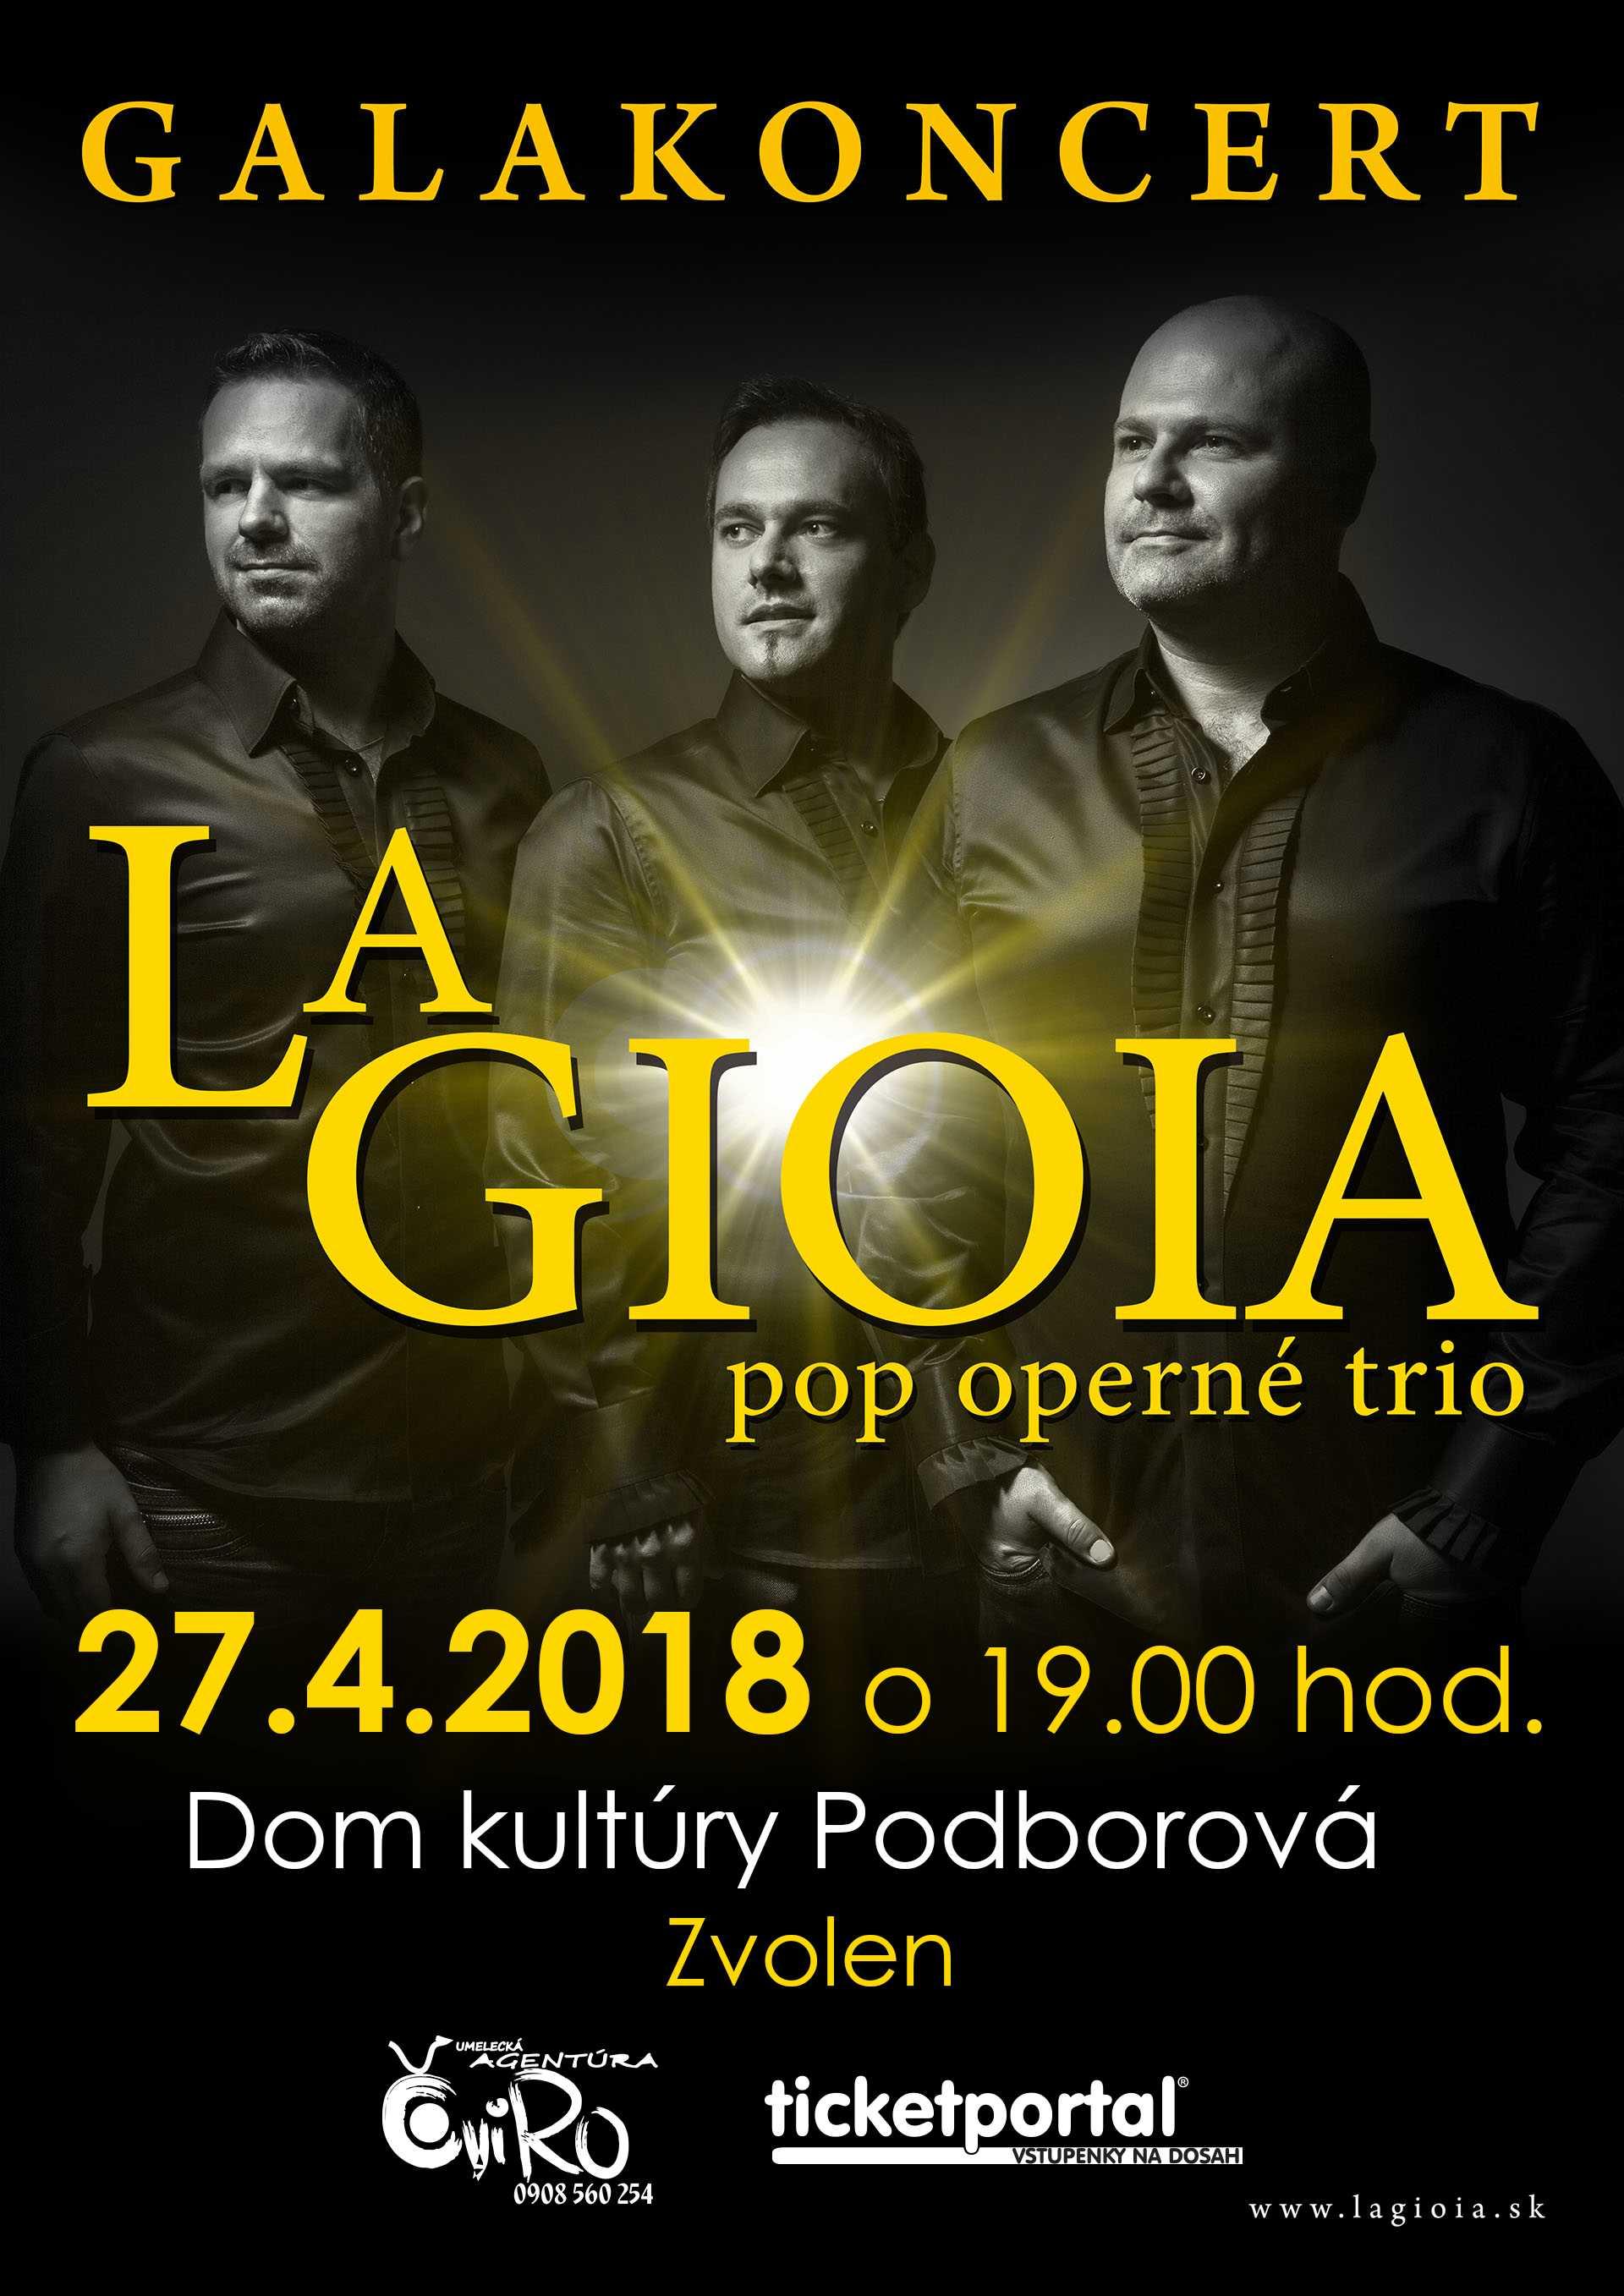 picture Galakoncert La GIOIA pop operné trio